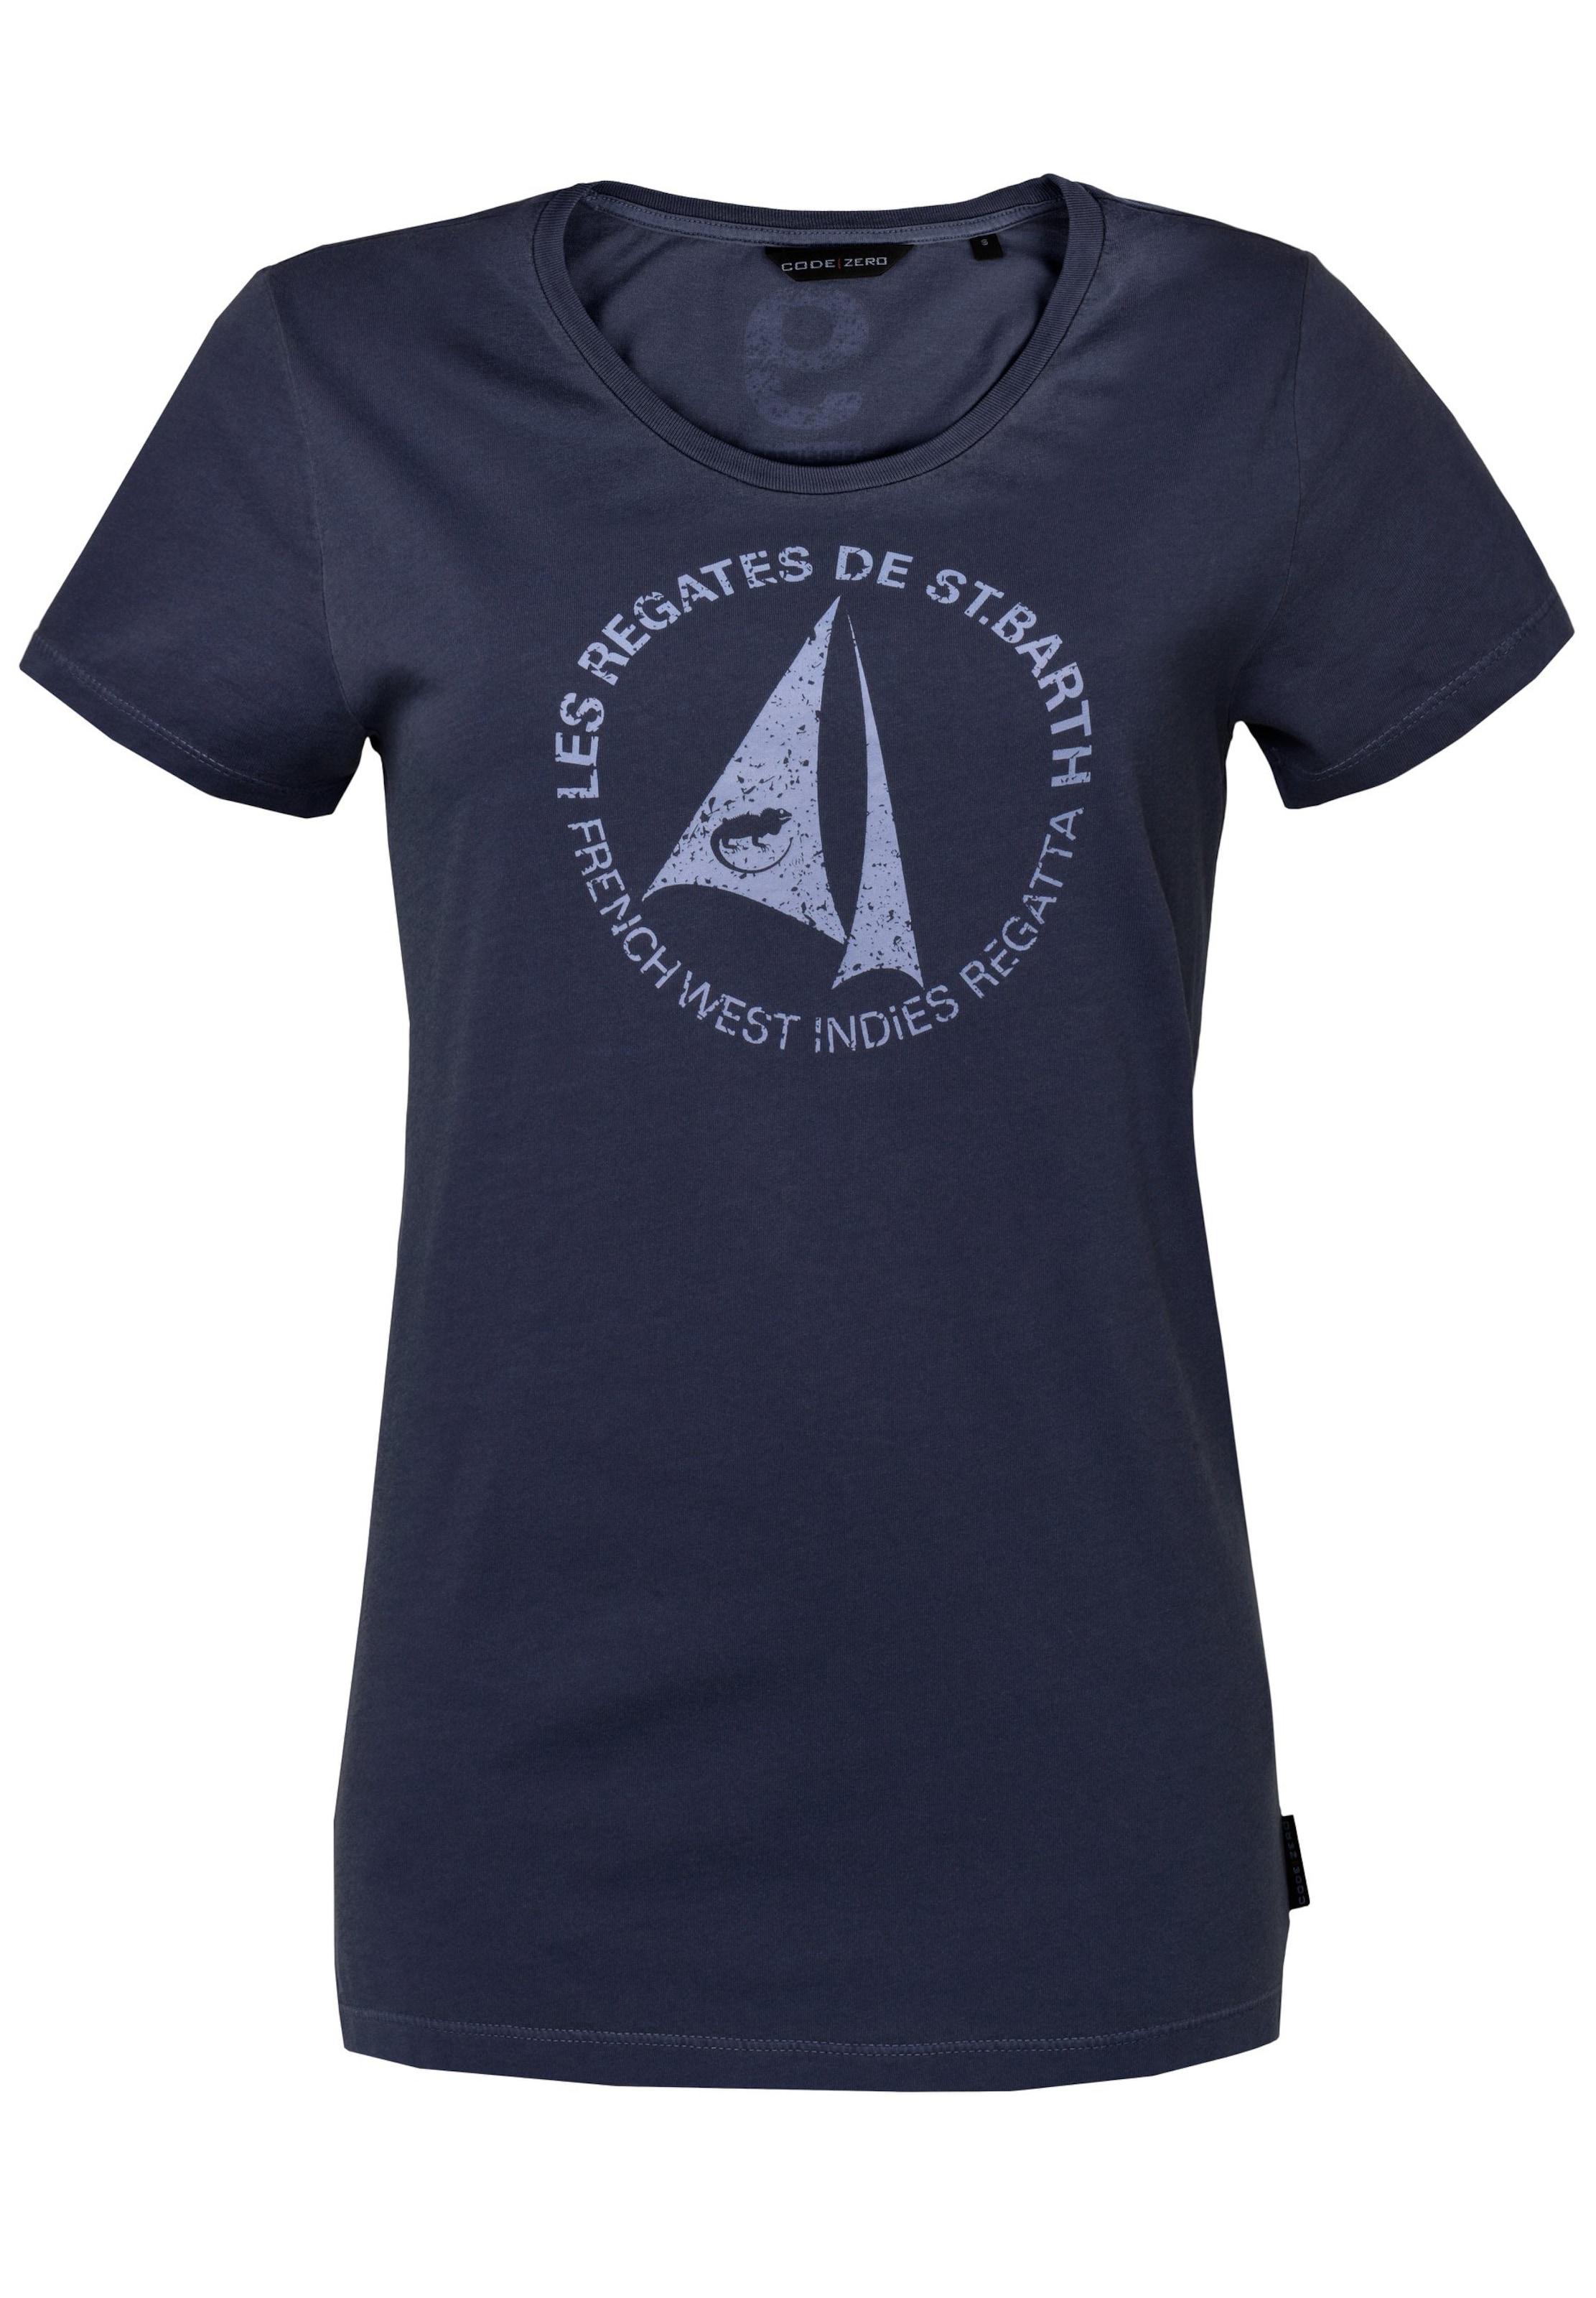 Code In zero T NavyHelllila shirt 'stBarth' AR34qjL5